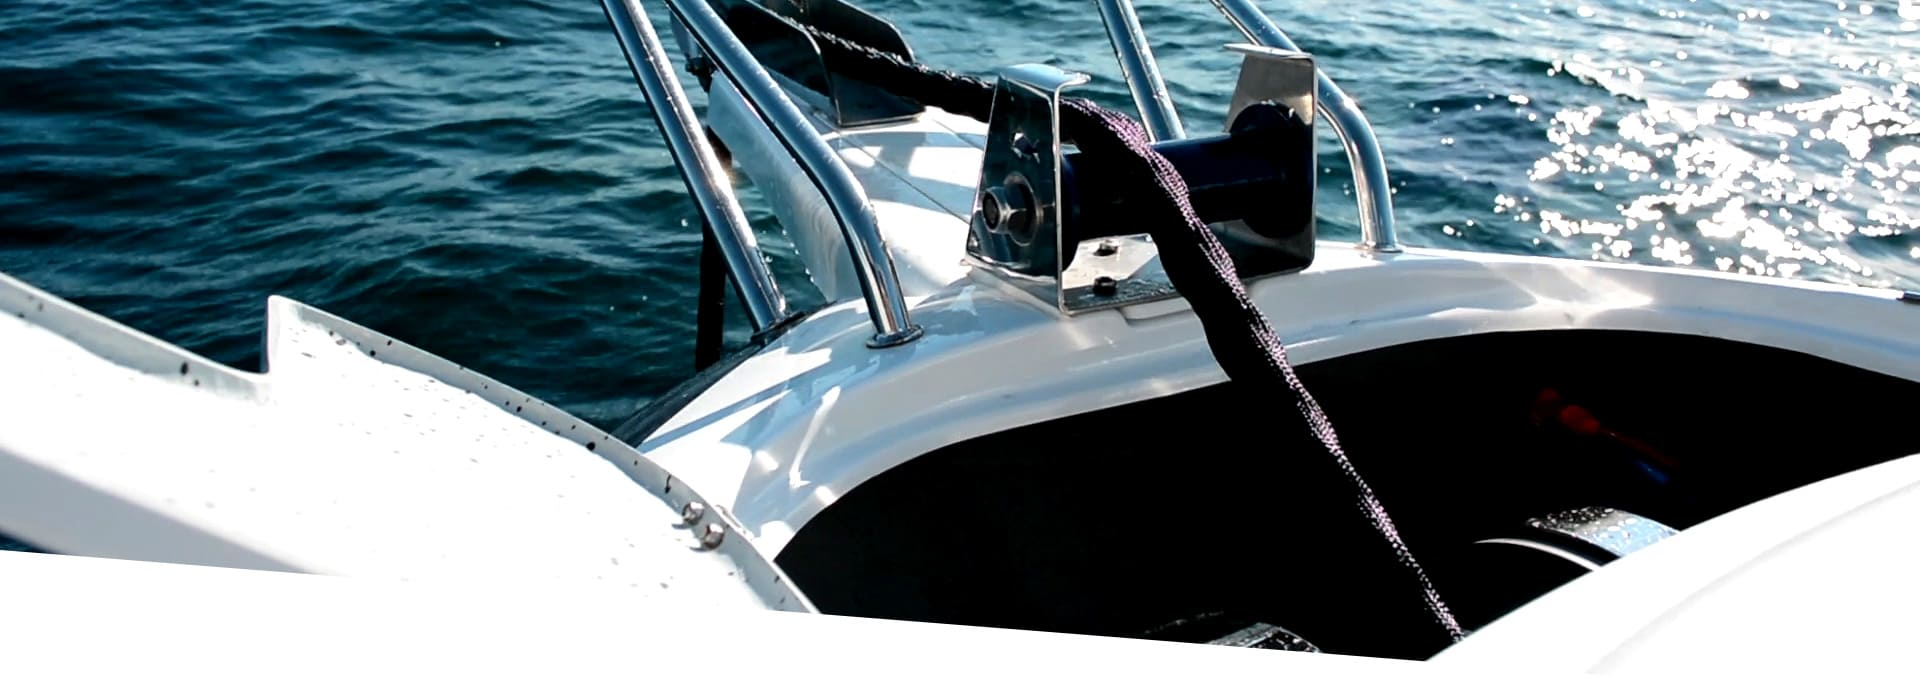 Premier Winch Wiring Diagram : Stress free marine australia s premier anchor winch